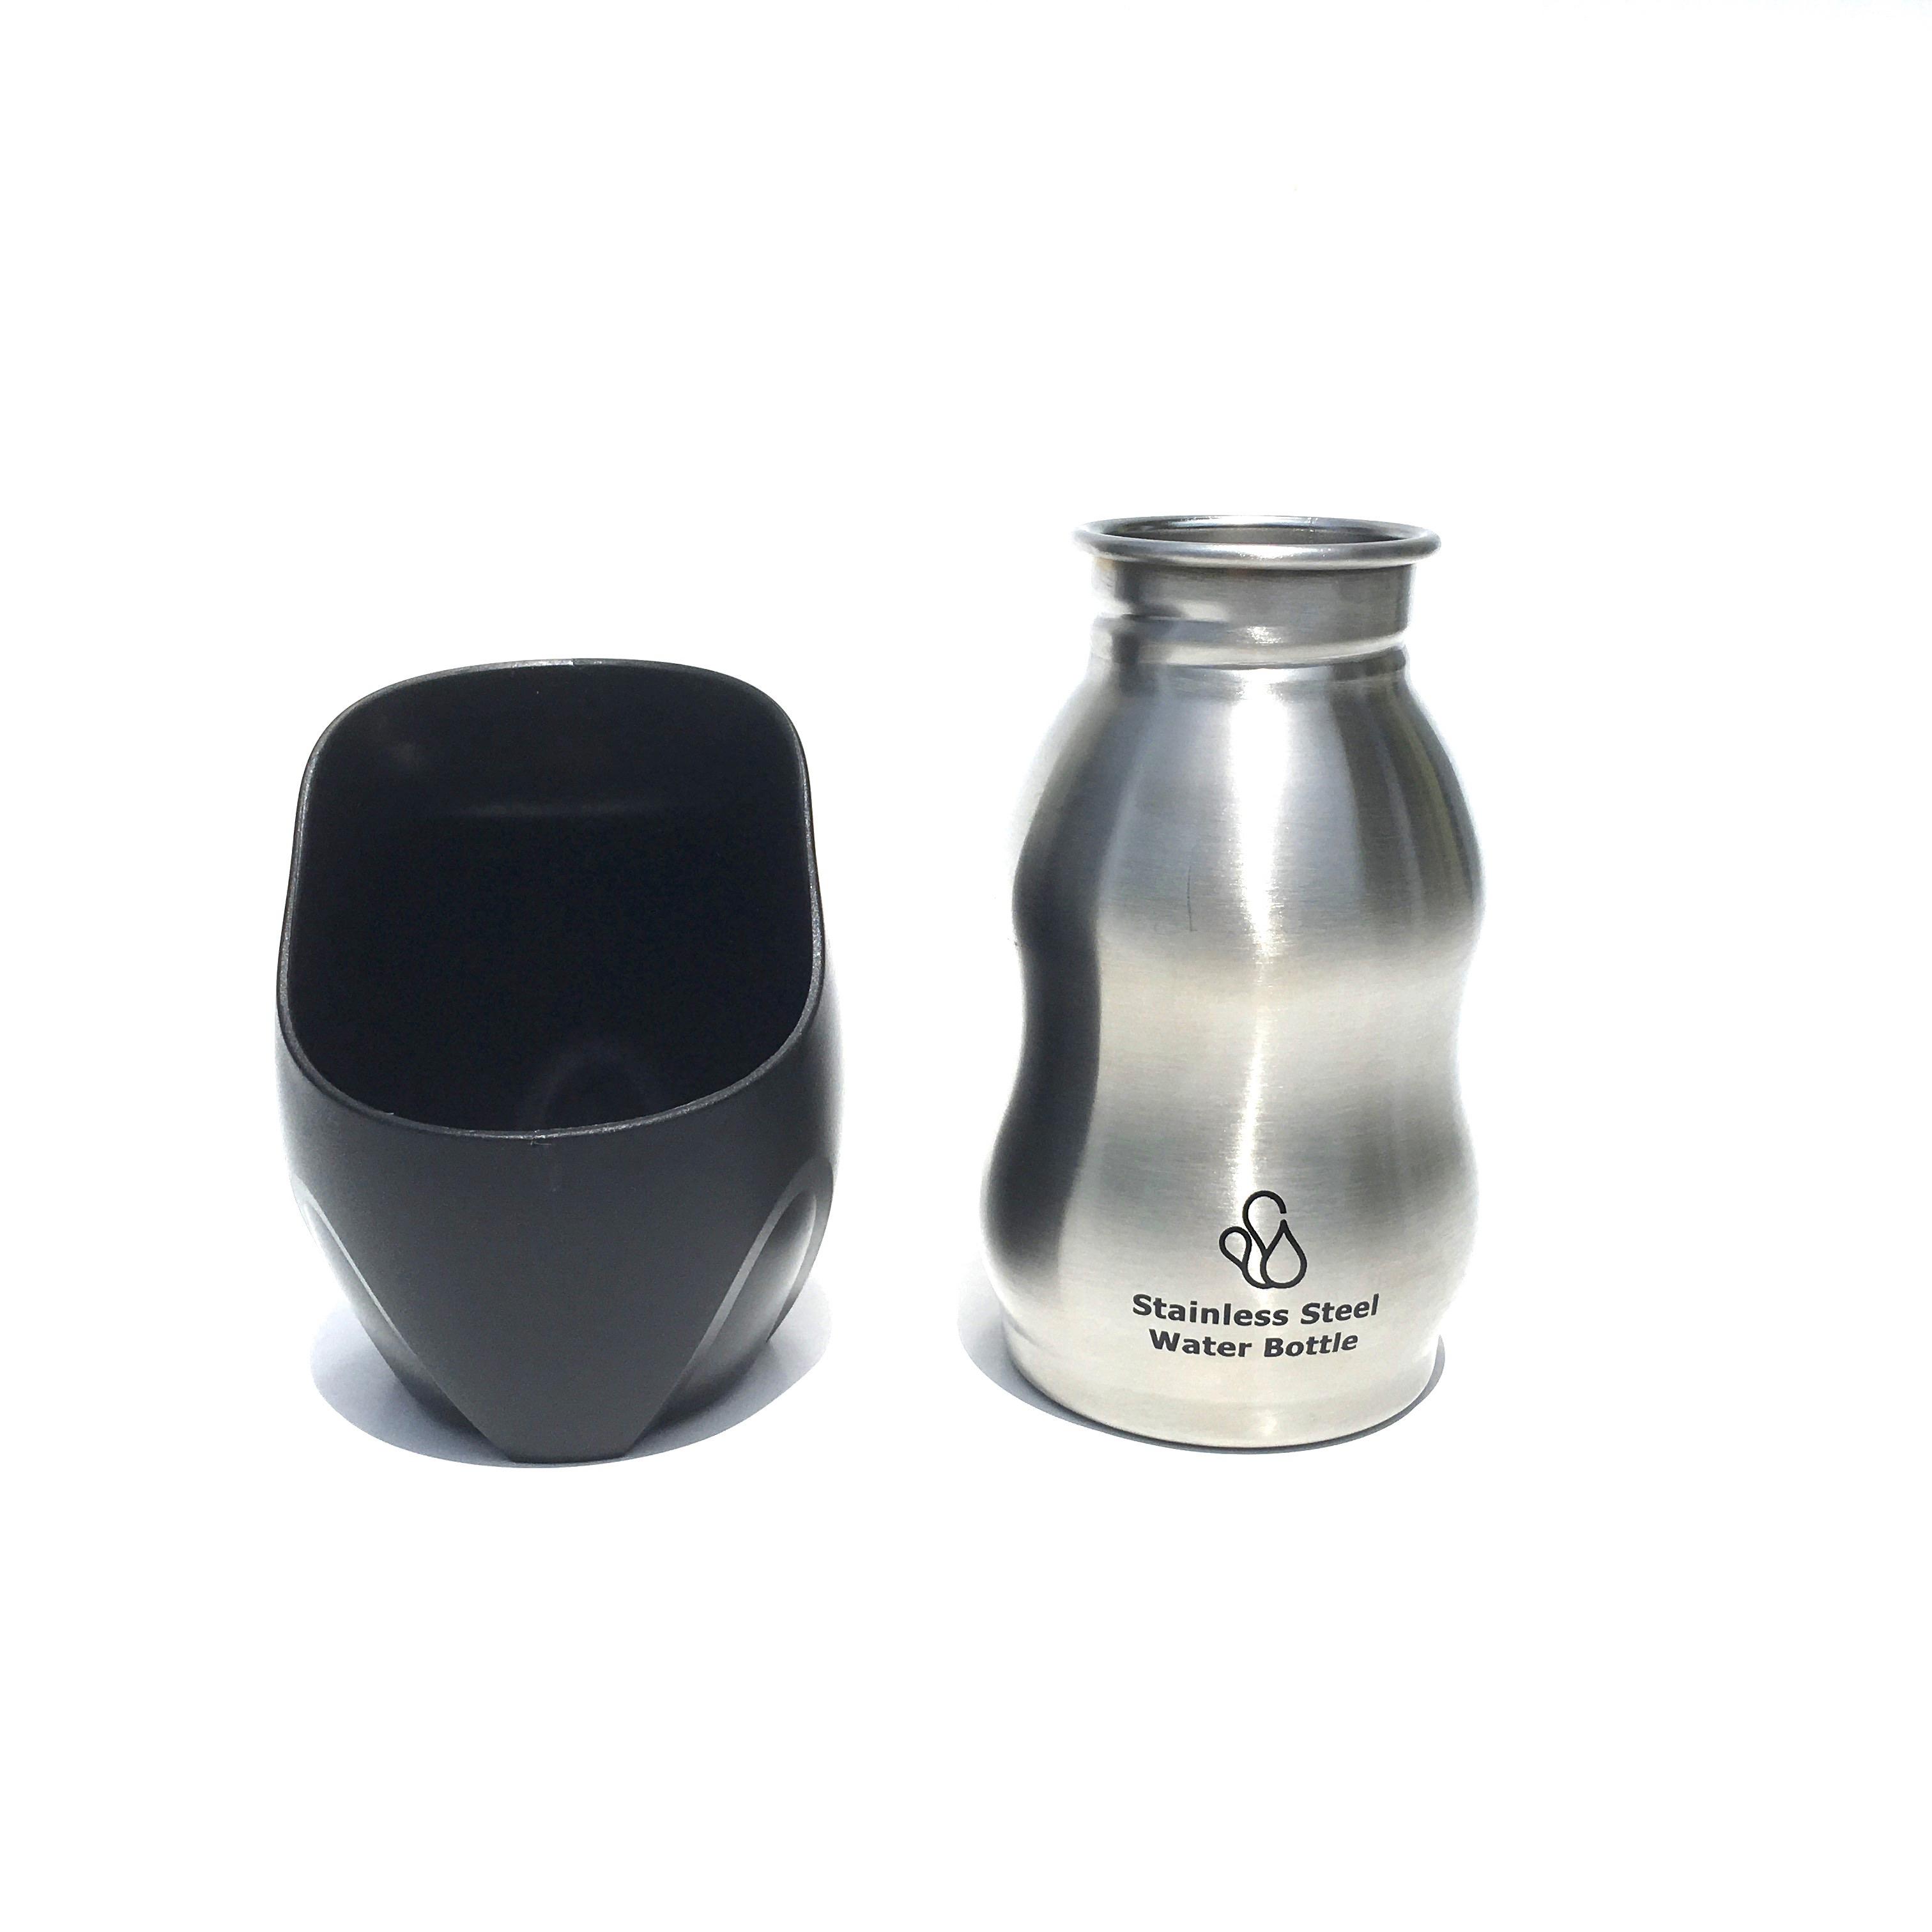 ROOKCRAN ROOP Stainless Bottle  ルークラン ループ ステンレス ボトル_d0217958_12241619.jpg